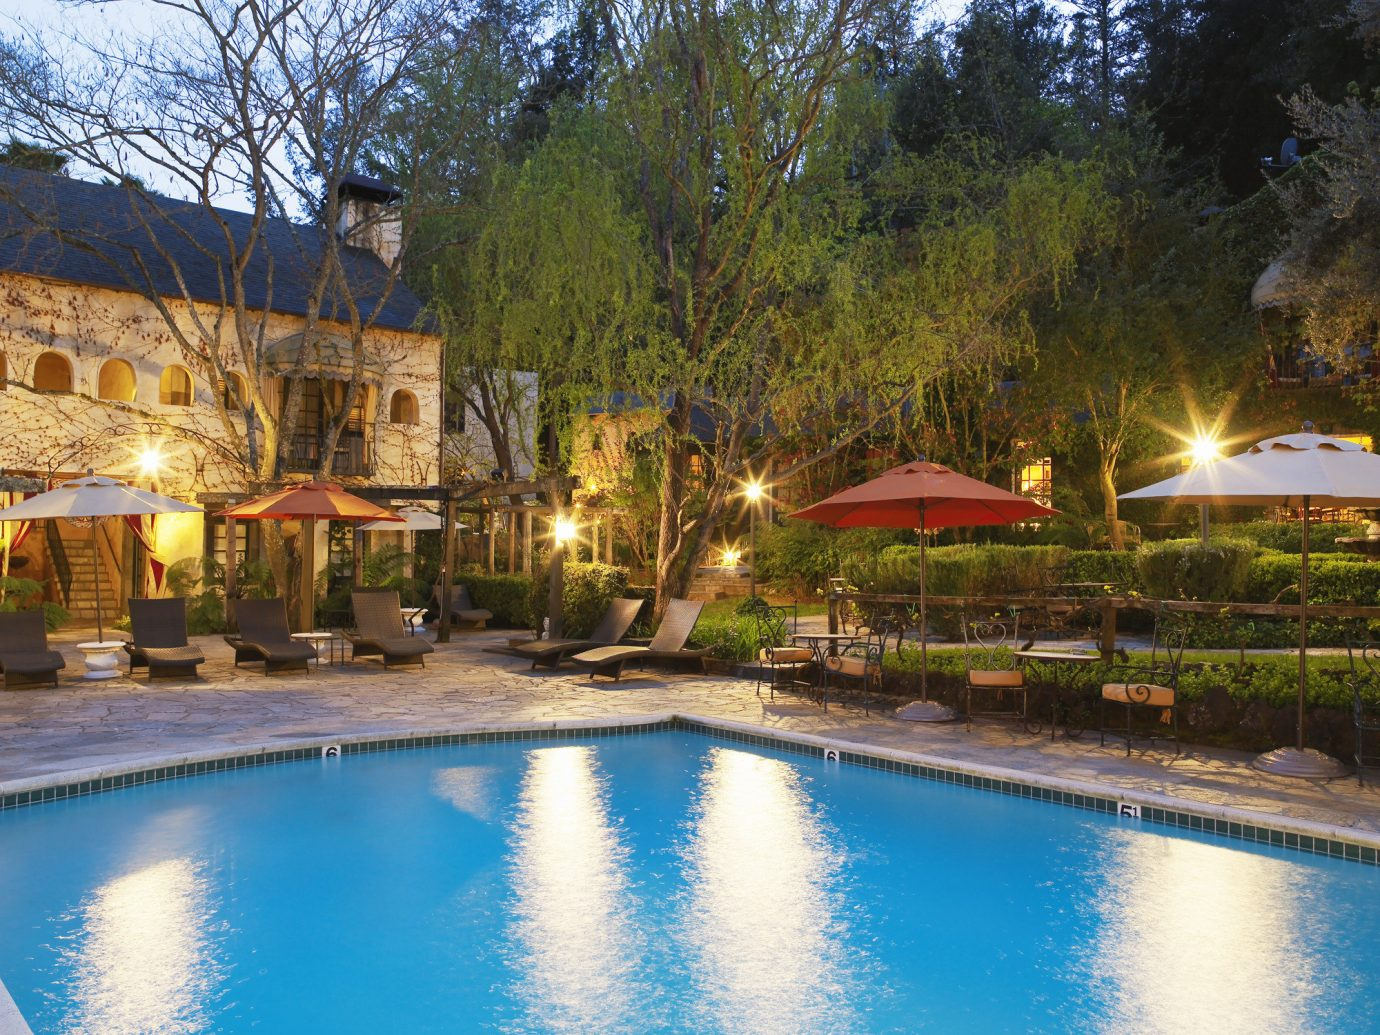 Pool at Kenwood Inn and Spa